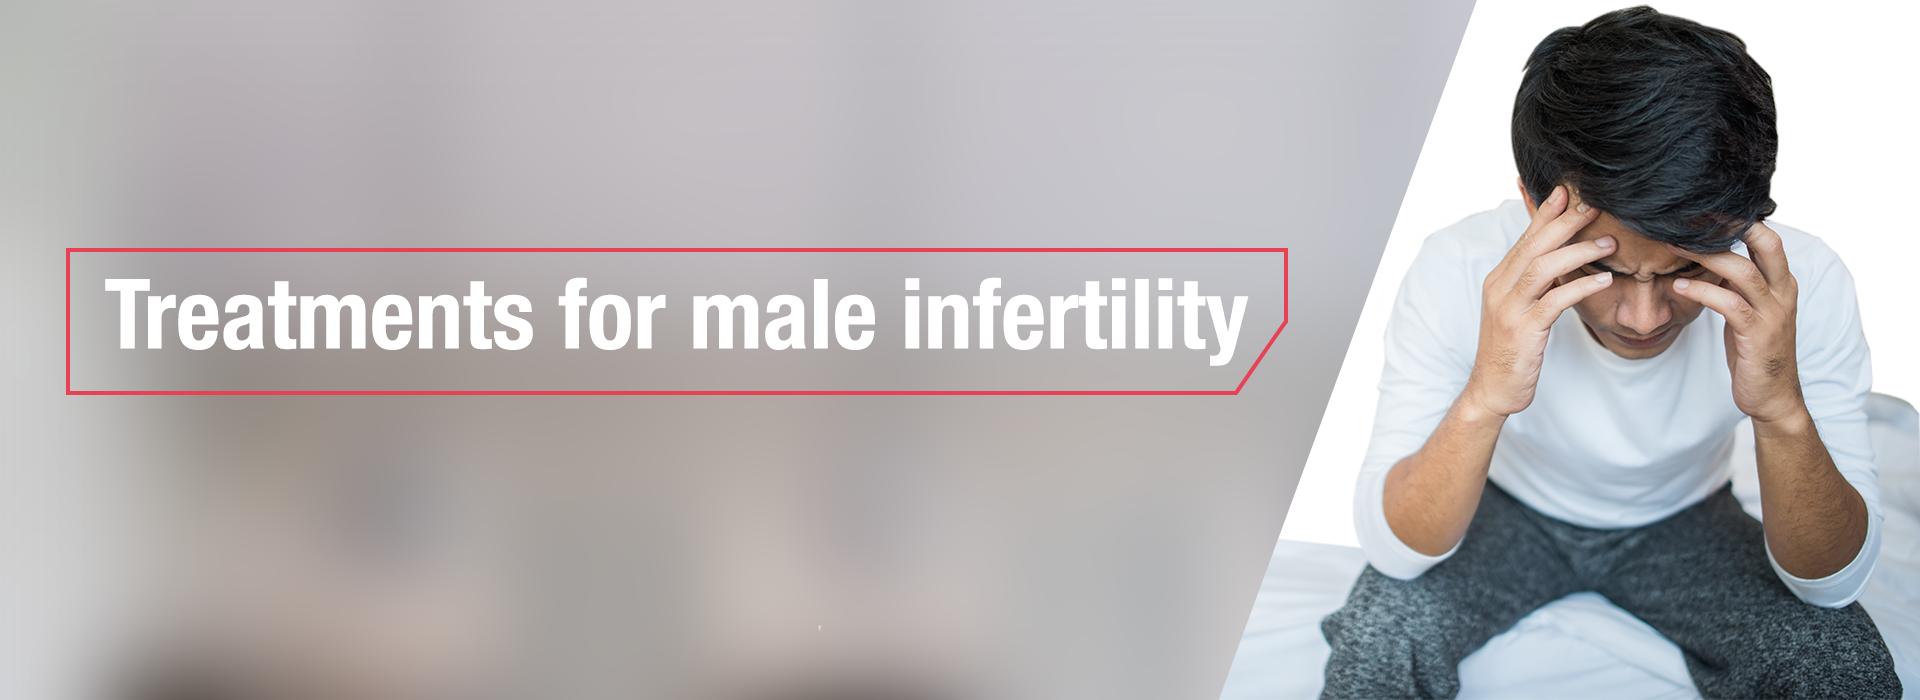 GarbhaGudi IVF – Best Infertility Treatment IVF Centre in Bengaluru